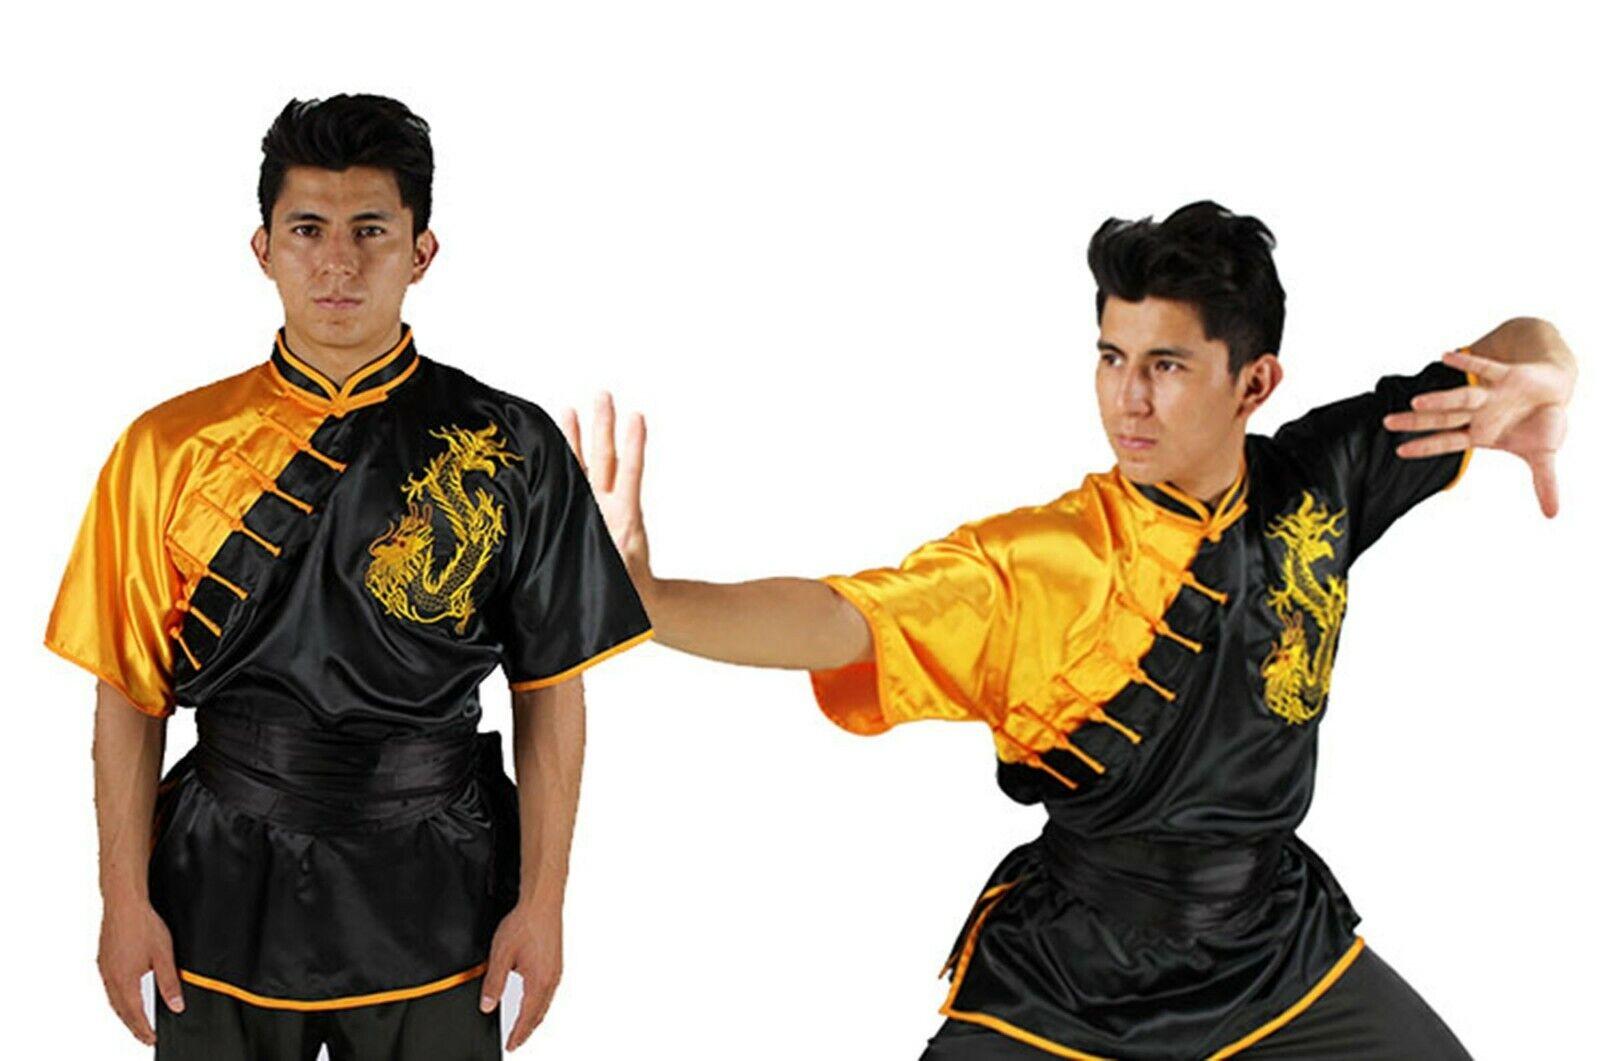 einheitliche Kimono KUNG FU Uniform Chang Quan Shan XI schwarz drago bestickt